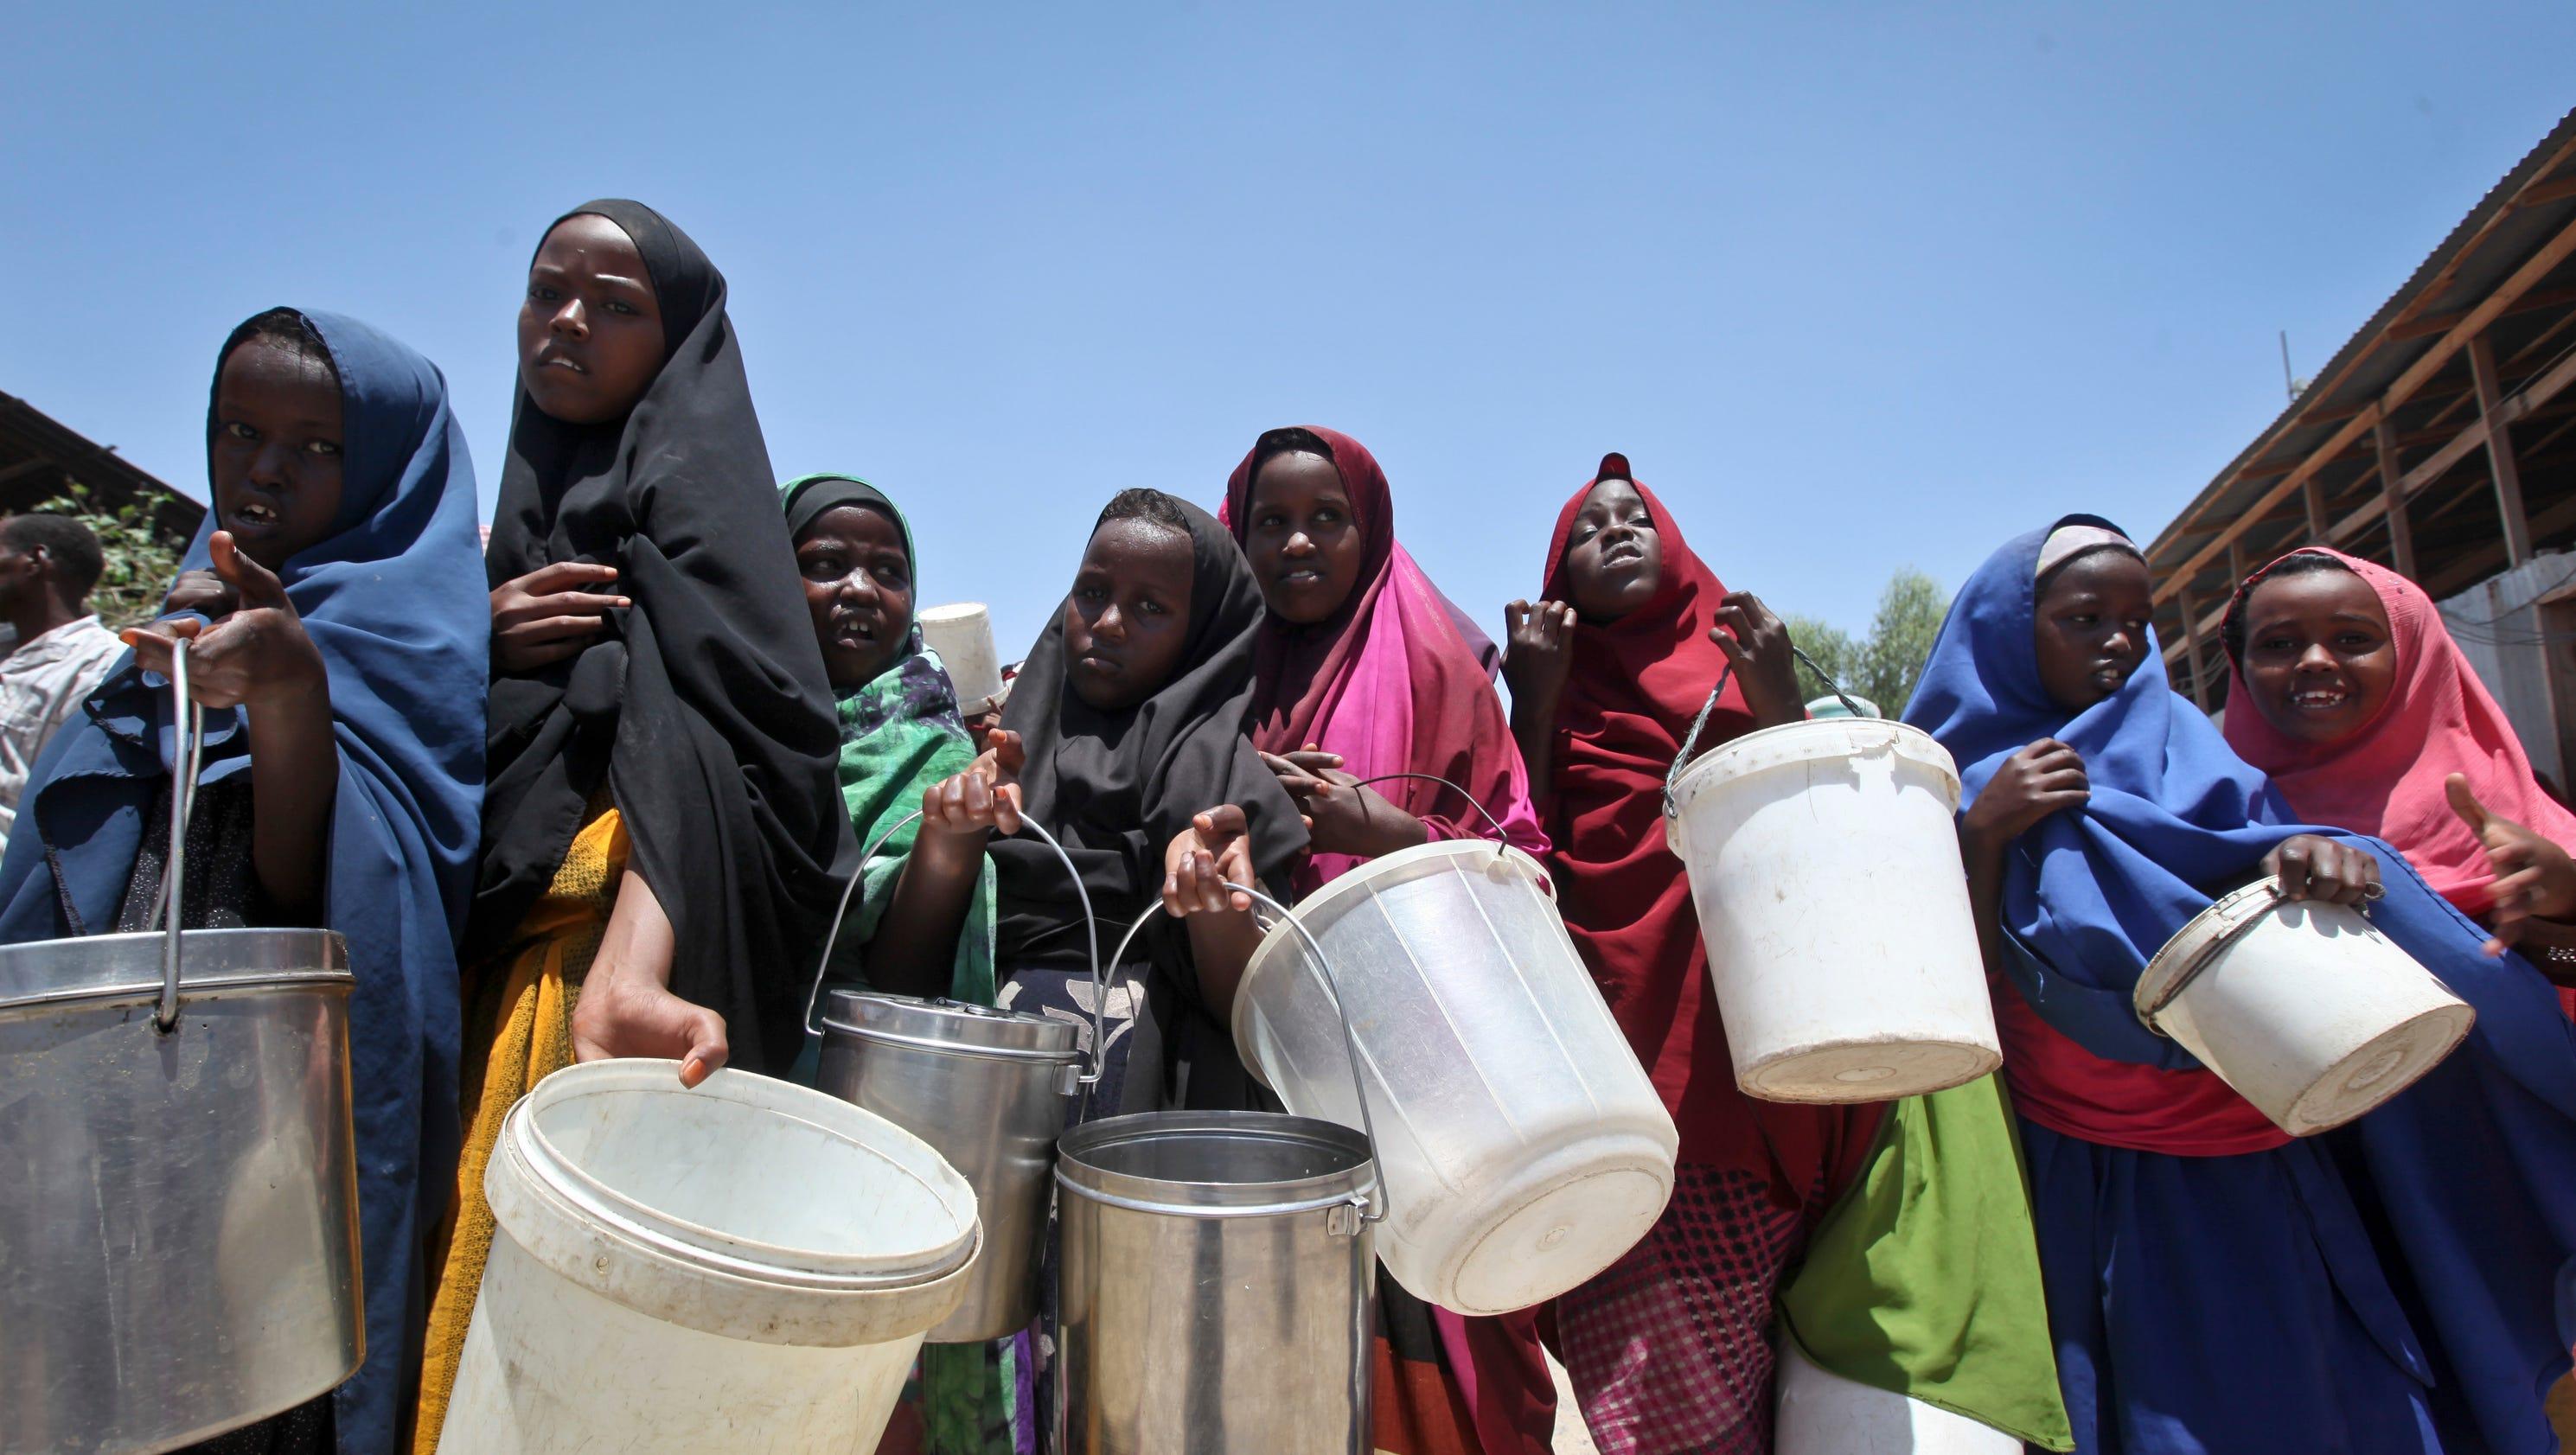 Drought in Somalia Raises Death Toll Over 100